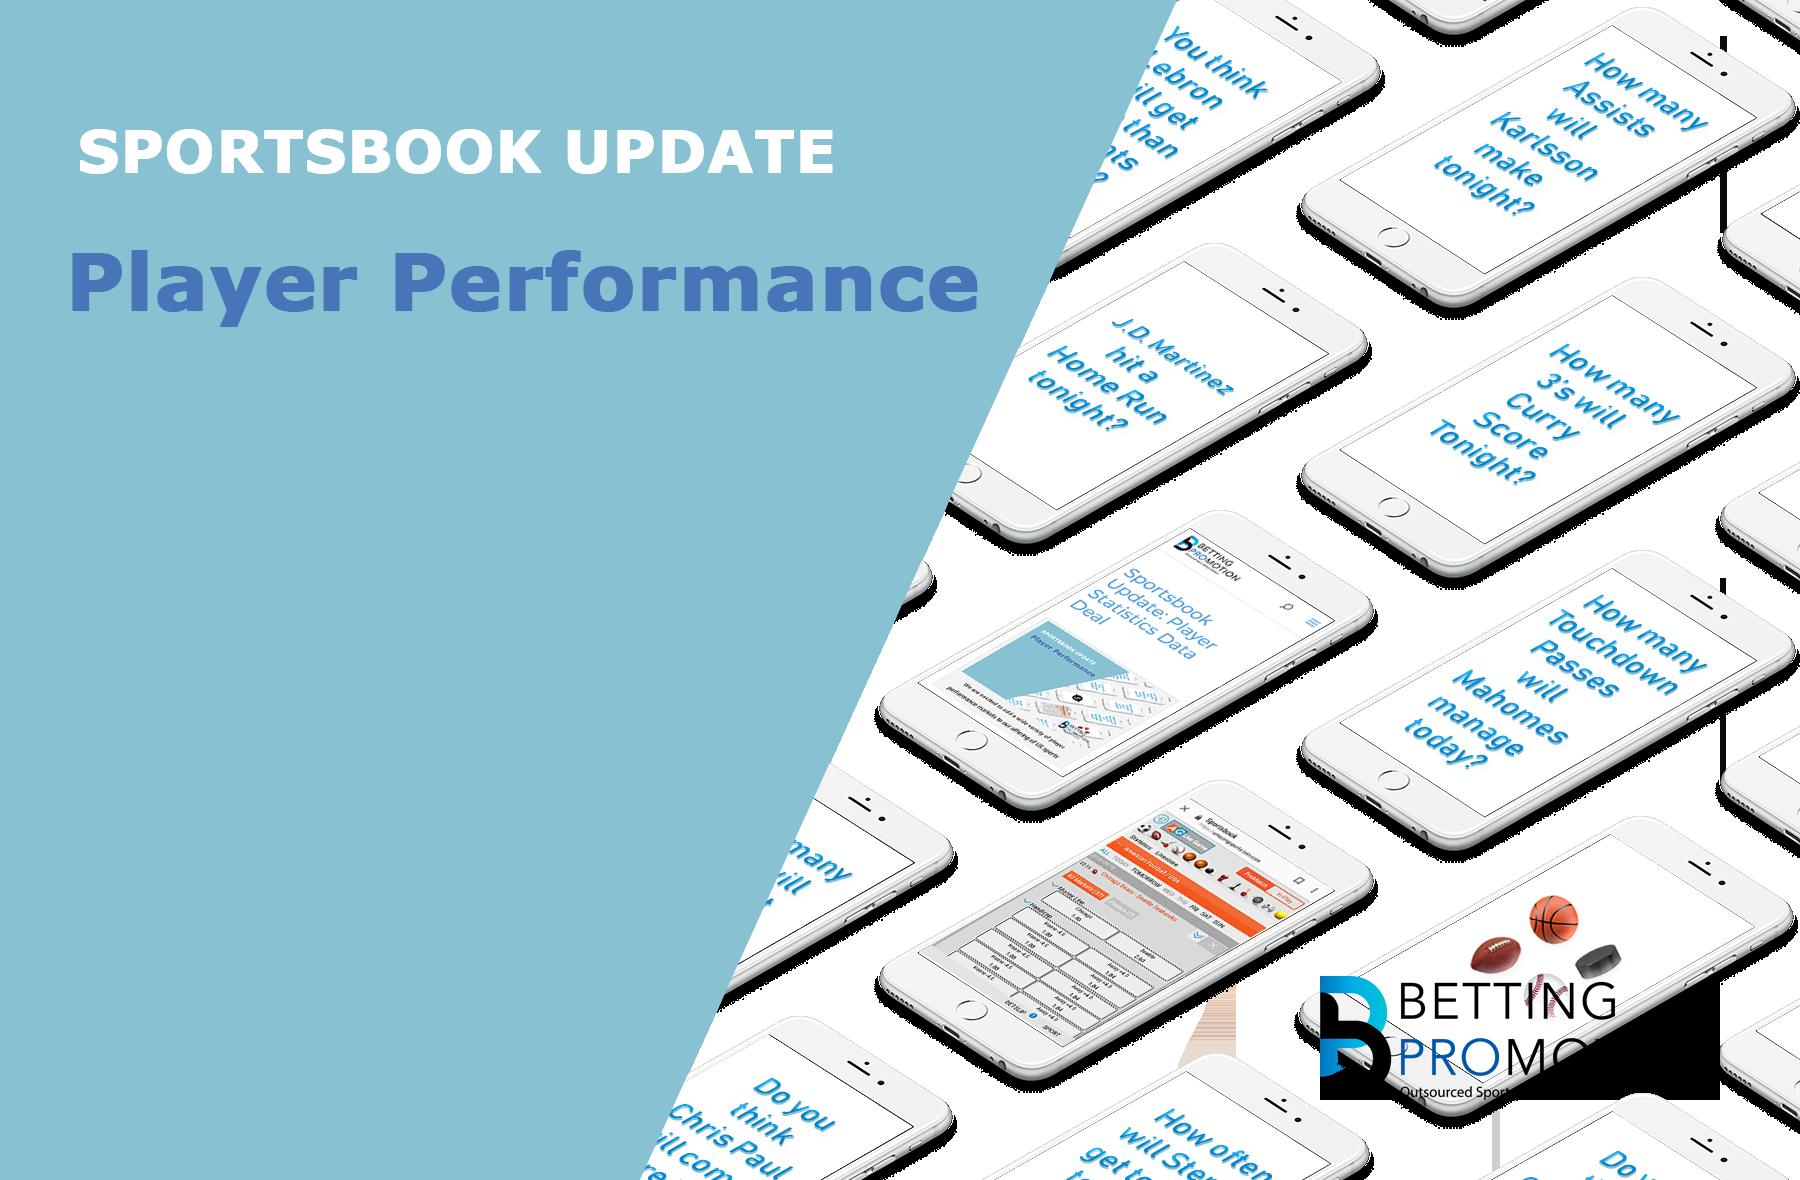 Player Performance Markets Opac